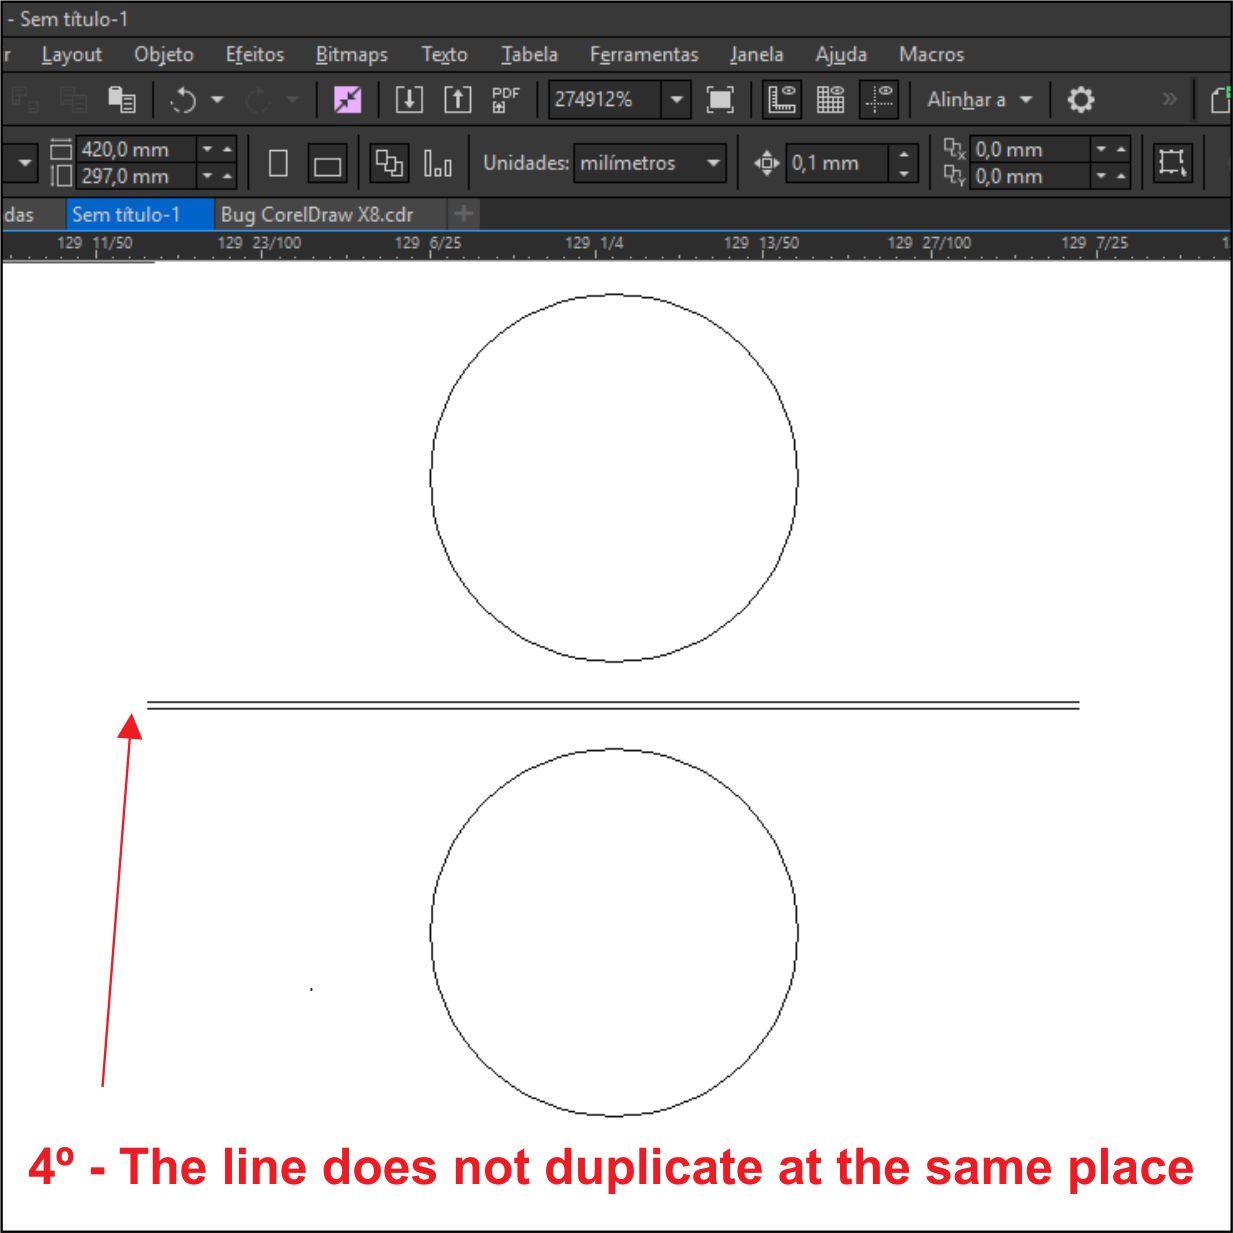 Inaccuracy problem - CorelDRAW X8 - CorelDRAW Graphics Suite